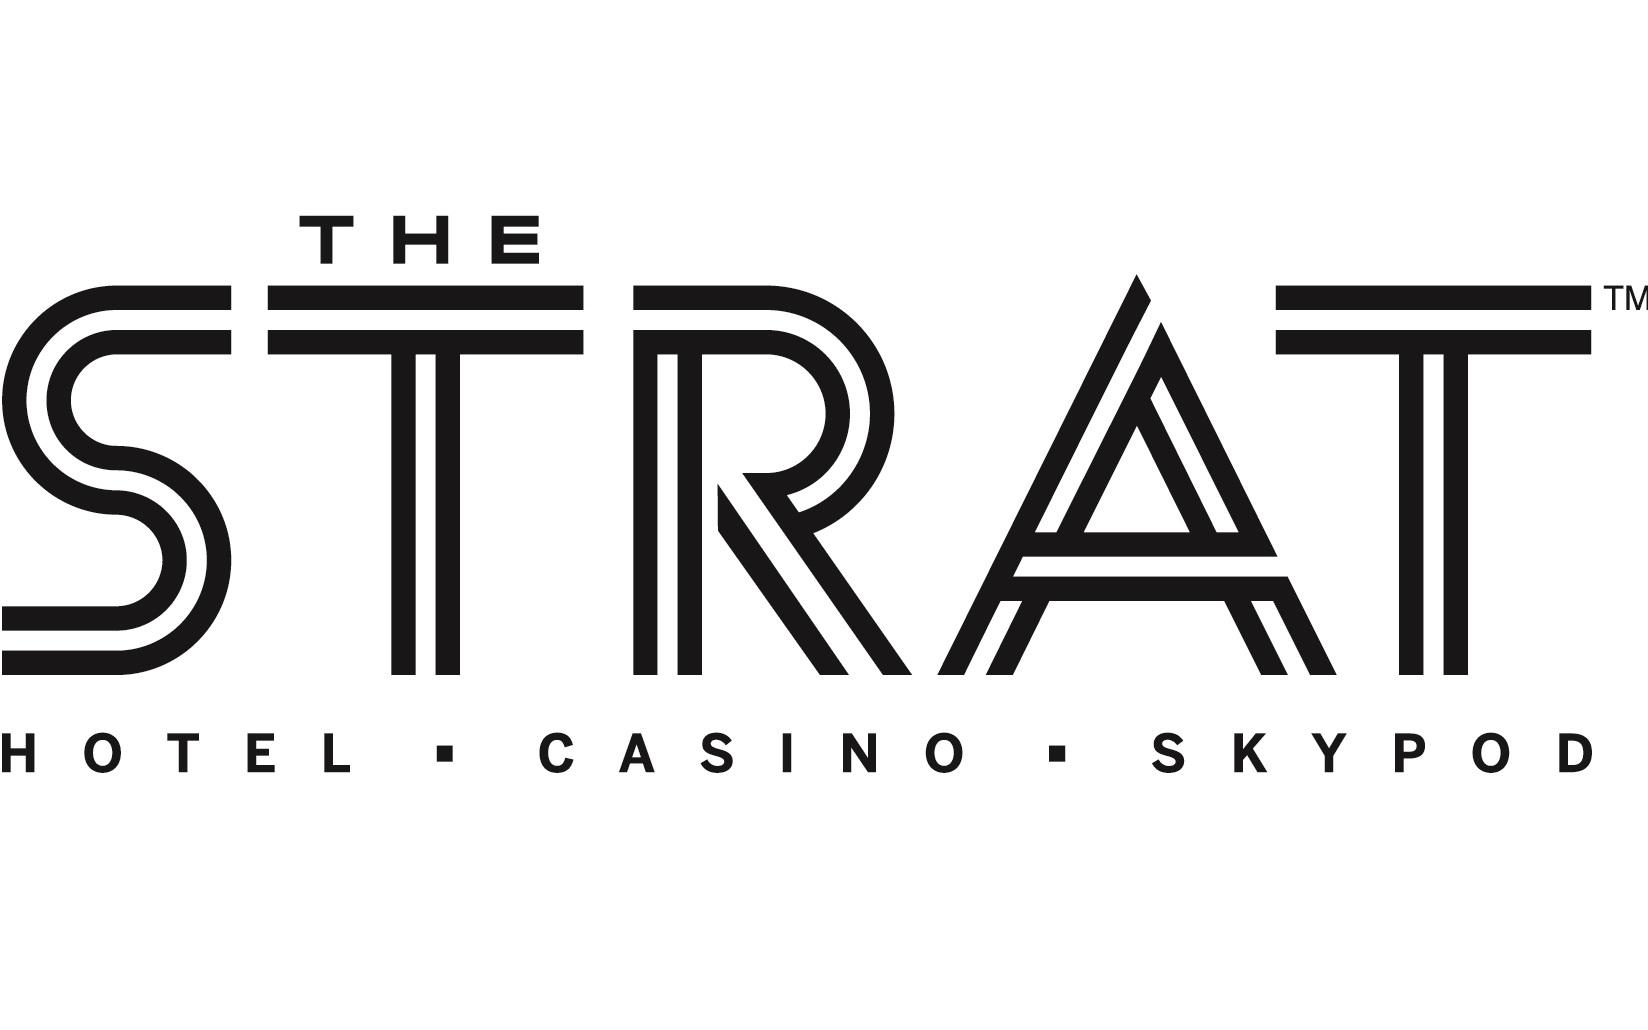 The Strat